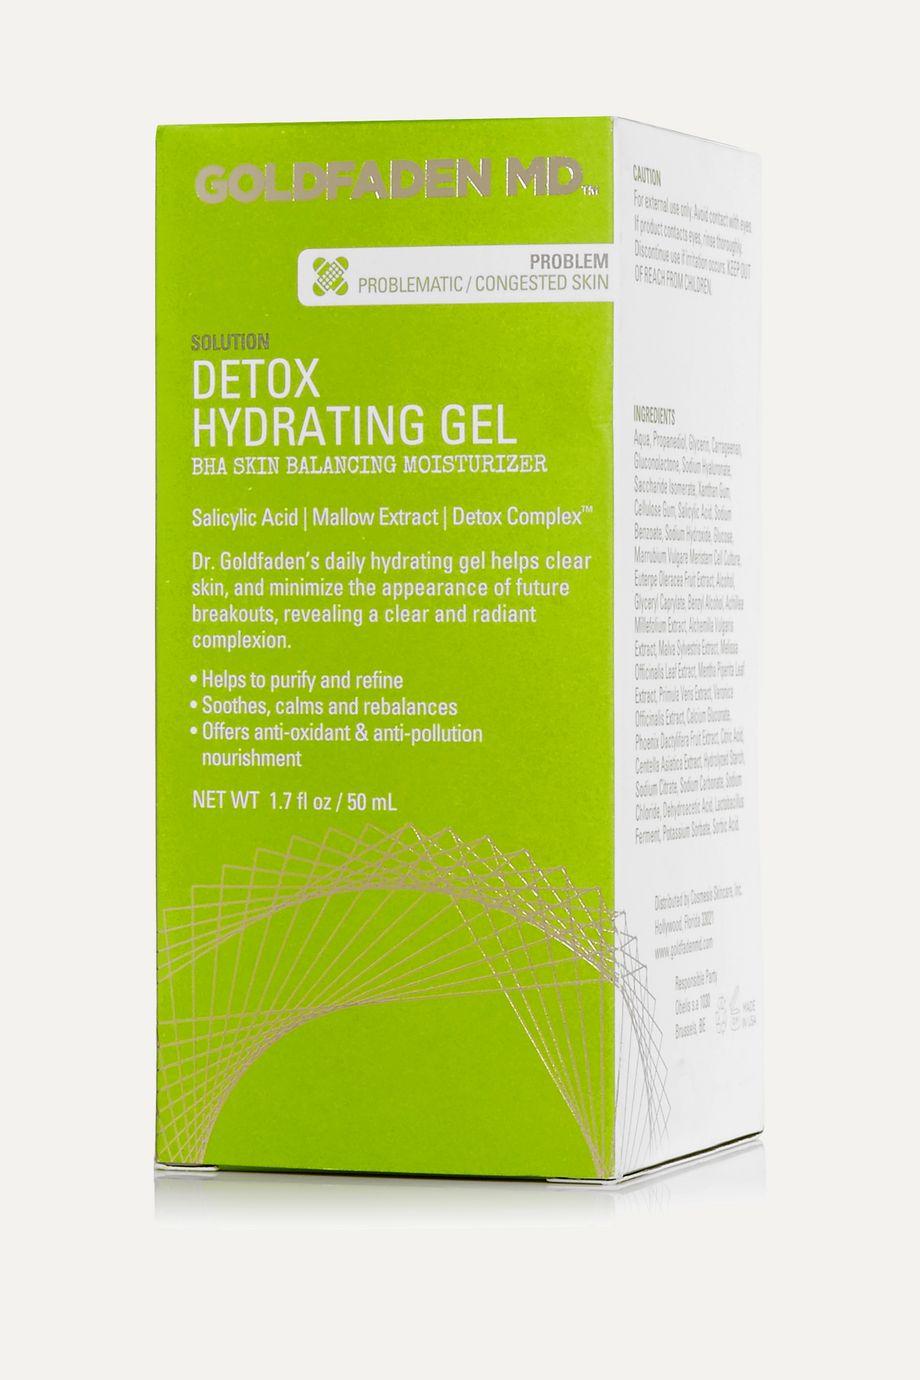 Goldfaden MD Detox Hydrating Gel, 50ml